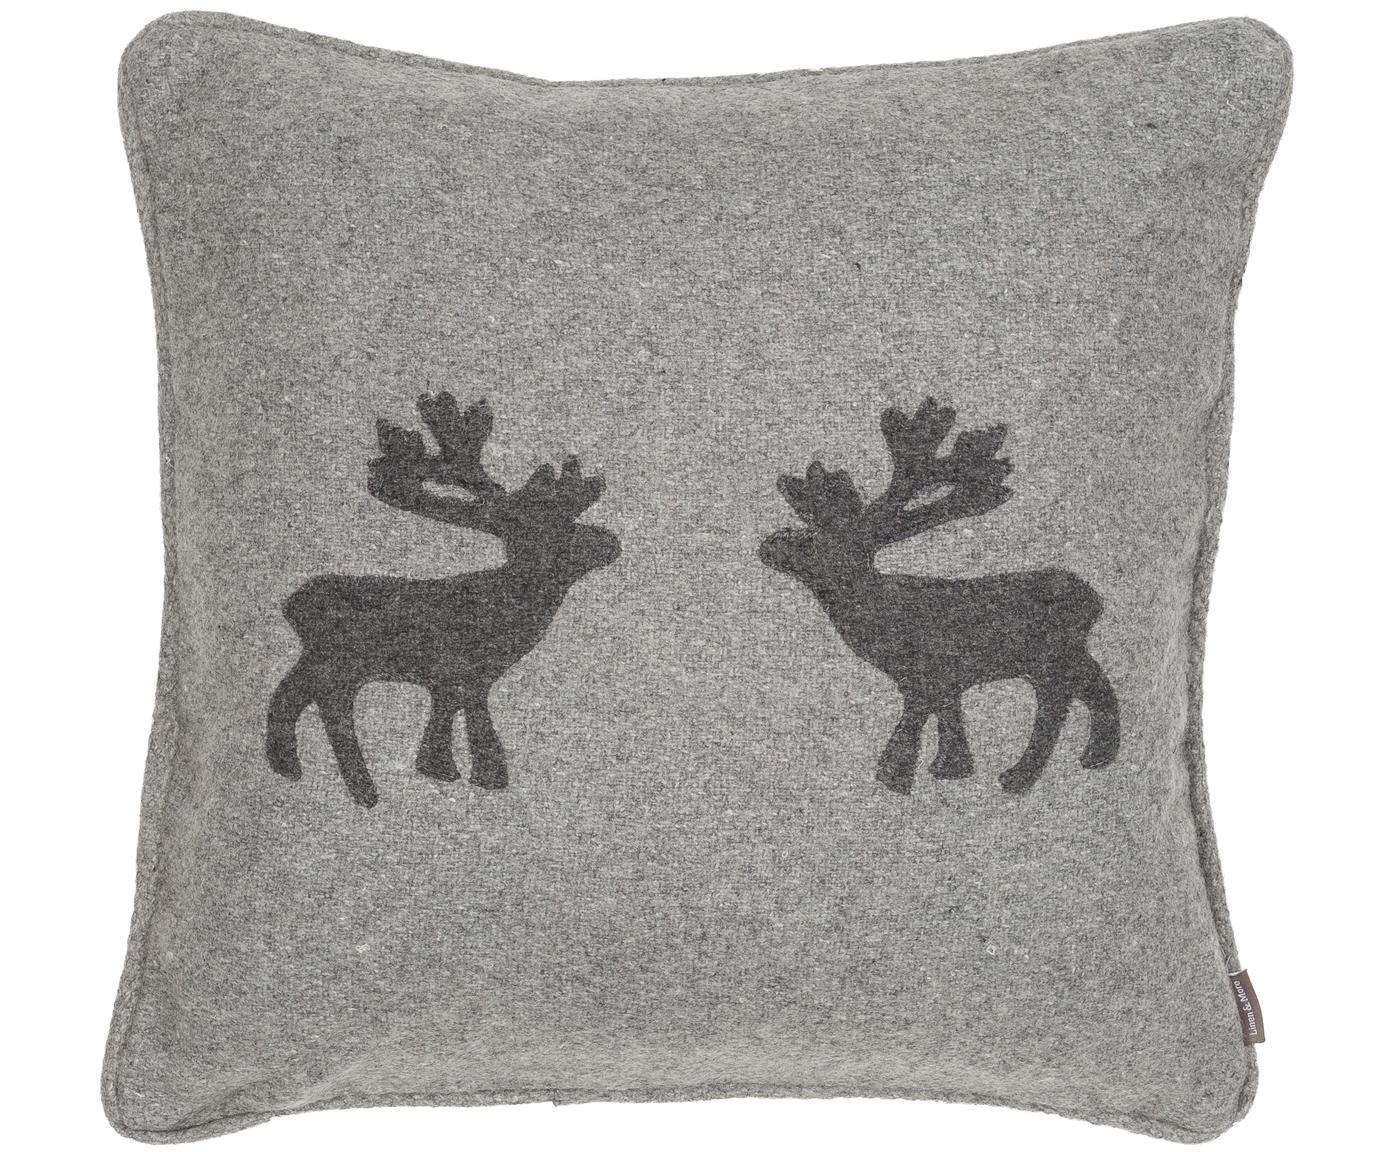 Cuscino in feltro di lana Sister Reindeer, Grigio chiaro, grigio scuro, P 45 x L 45 cm